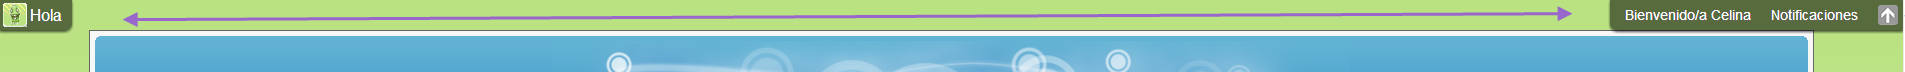 Trucos/astucias para modificar la Toolbar Tool6710